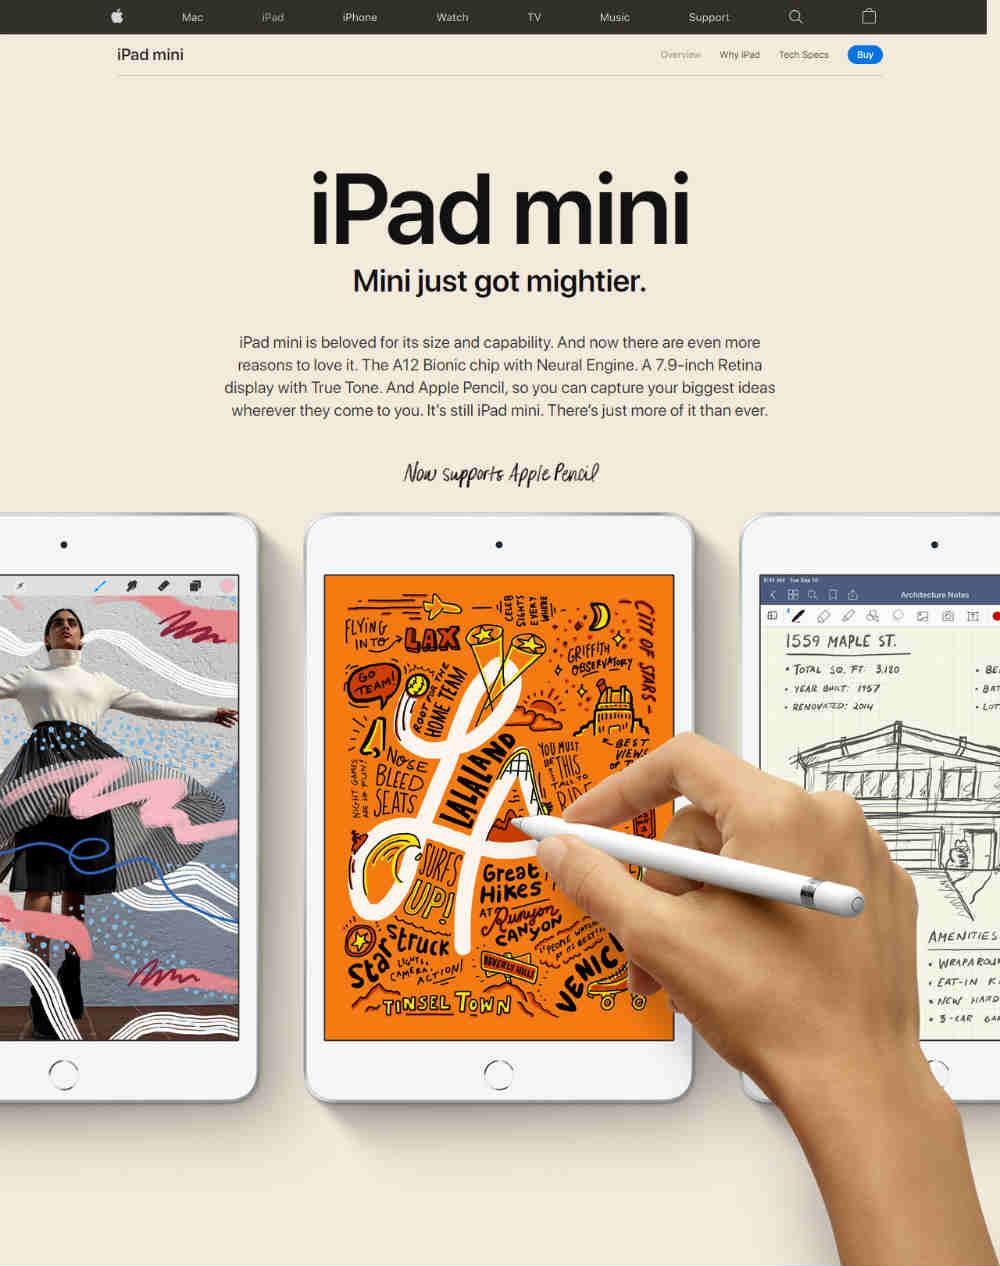 apple web page